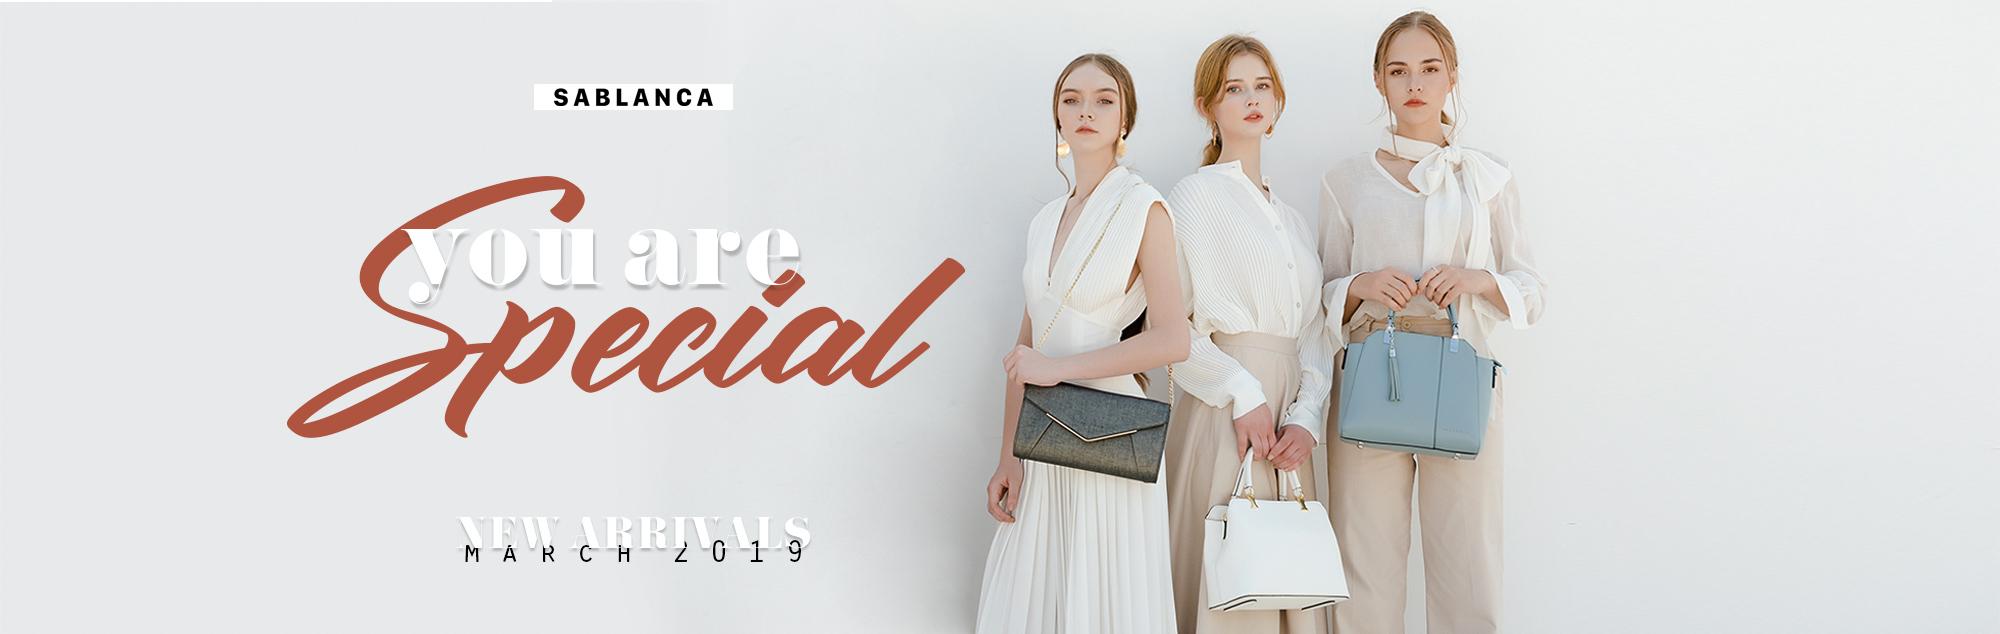 sablanca-new-arrival-march-2019